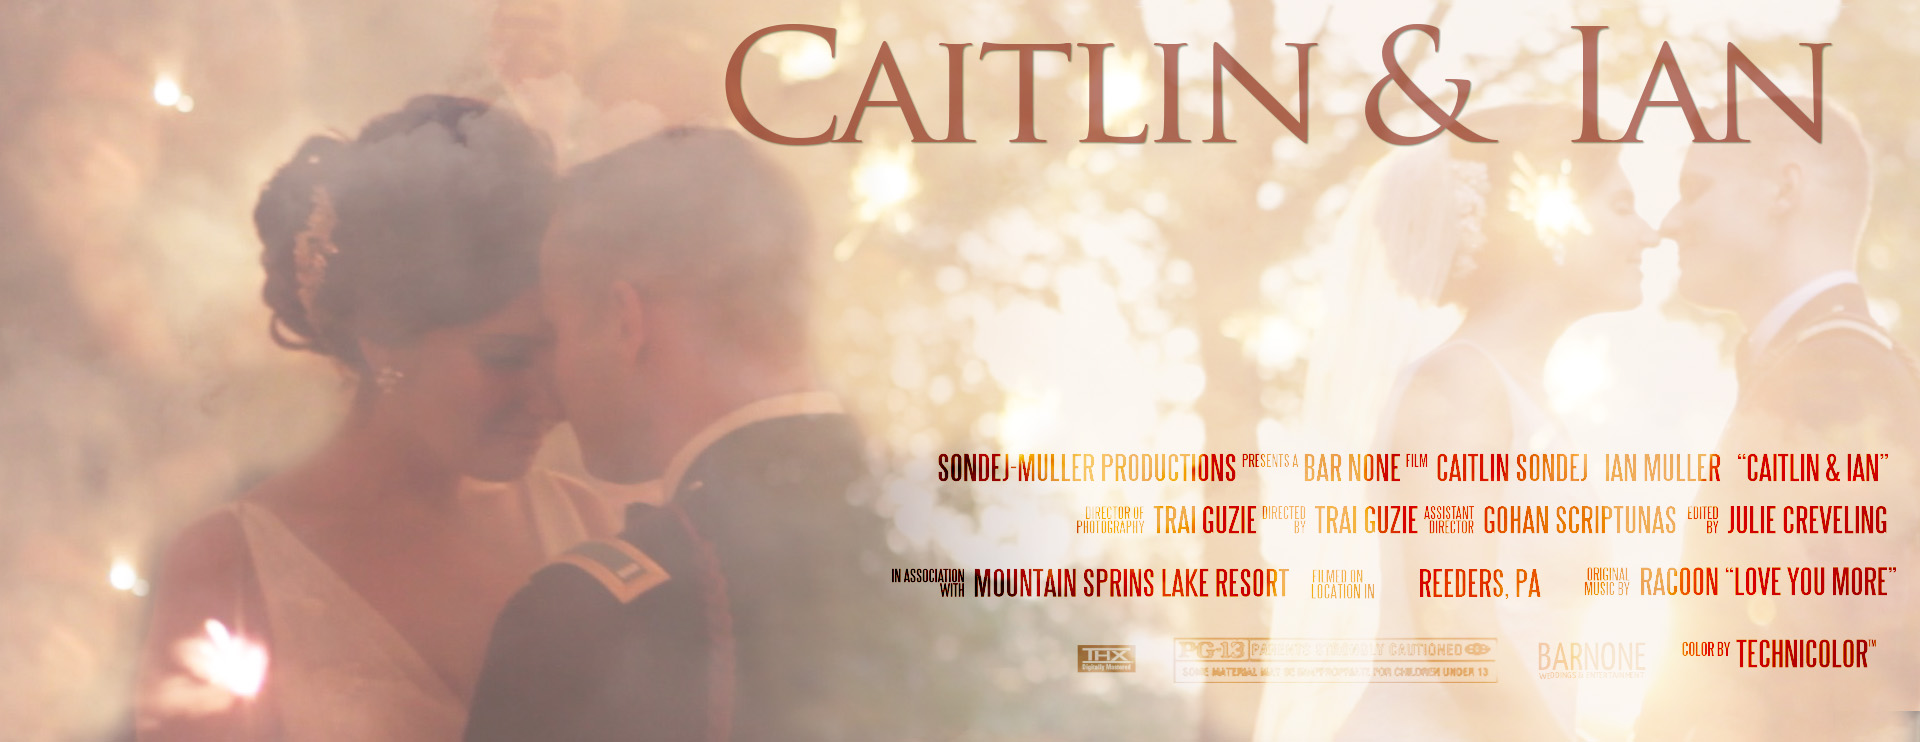 Thumbnail Movie Poster - Mountain Springs Lake Feature Wedding Film - Caitlin & Ian